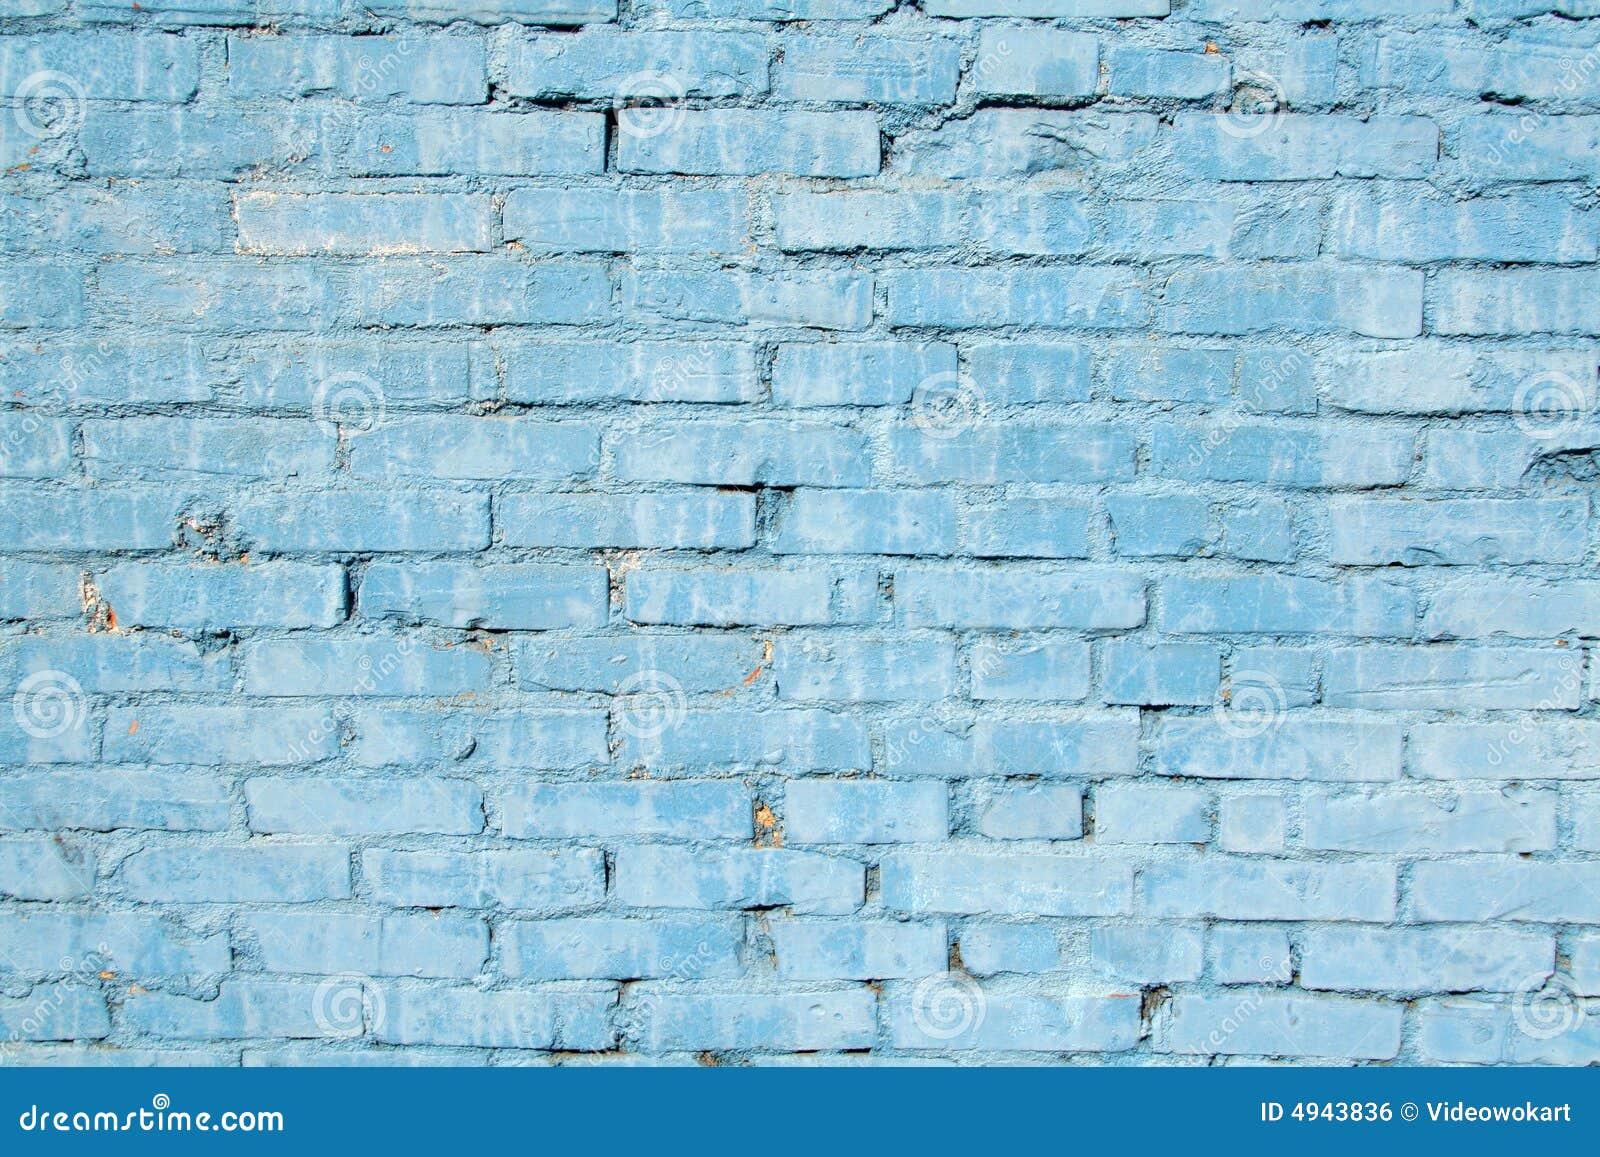 mur de briques bleu image libre de droits image 4943836. Black Bedroom Furniture Sets. Home Design Ideas